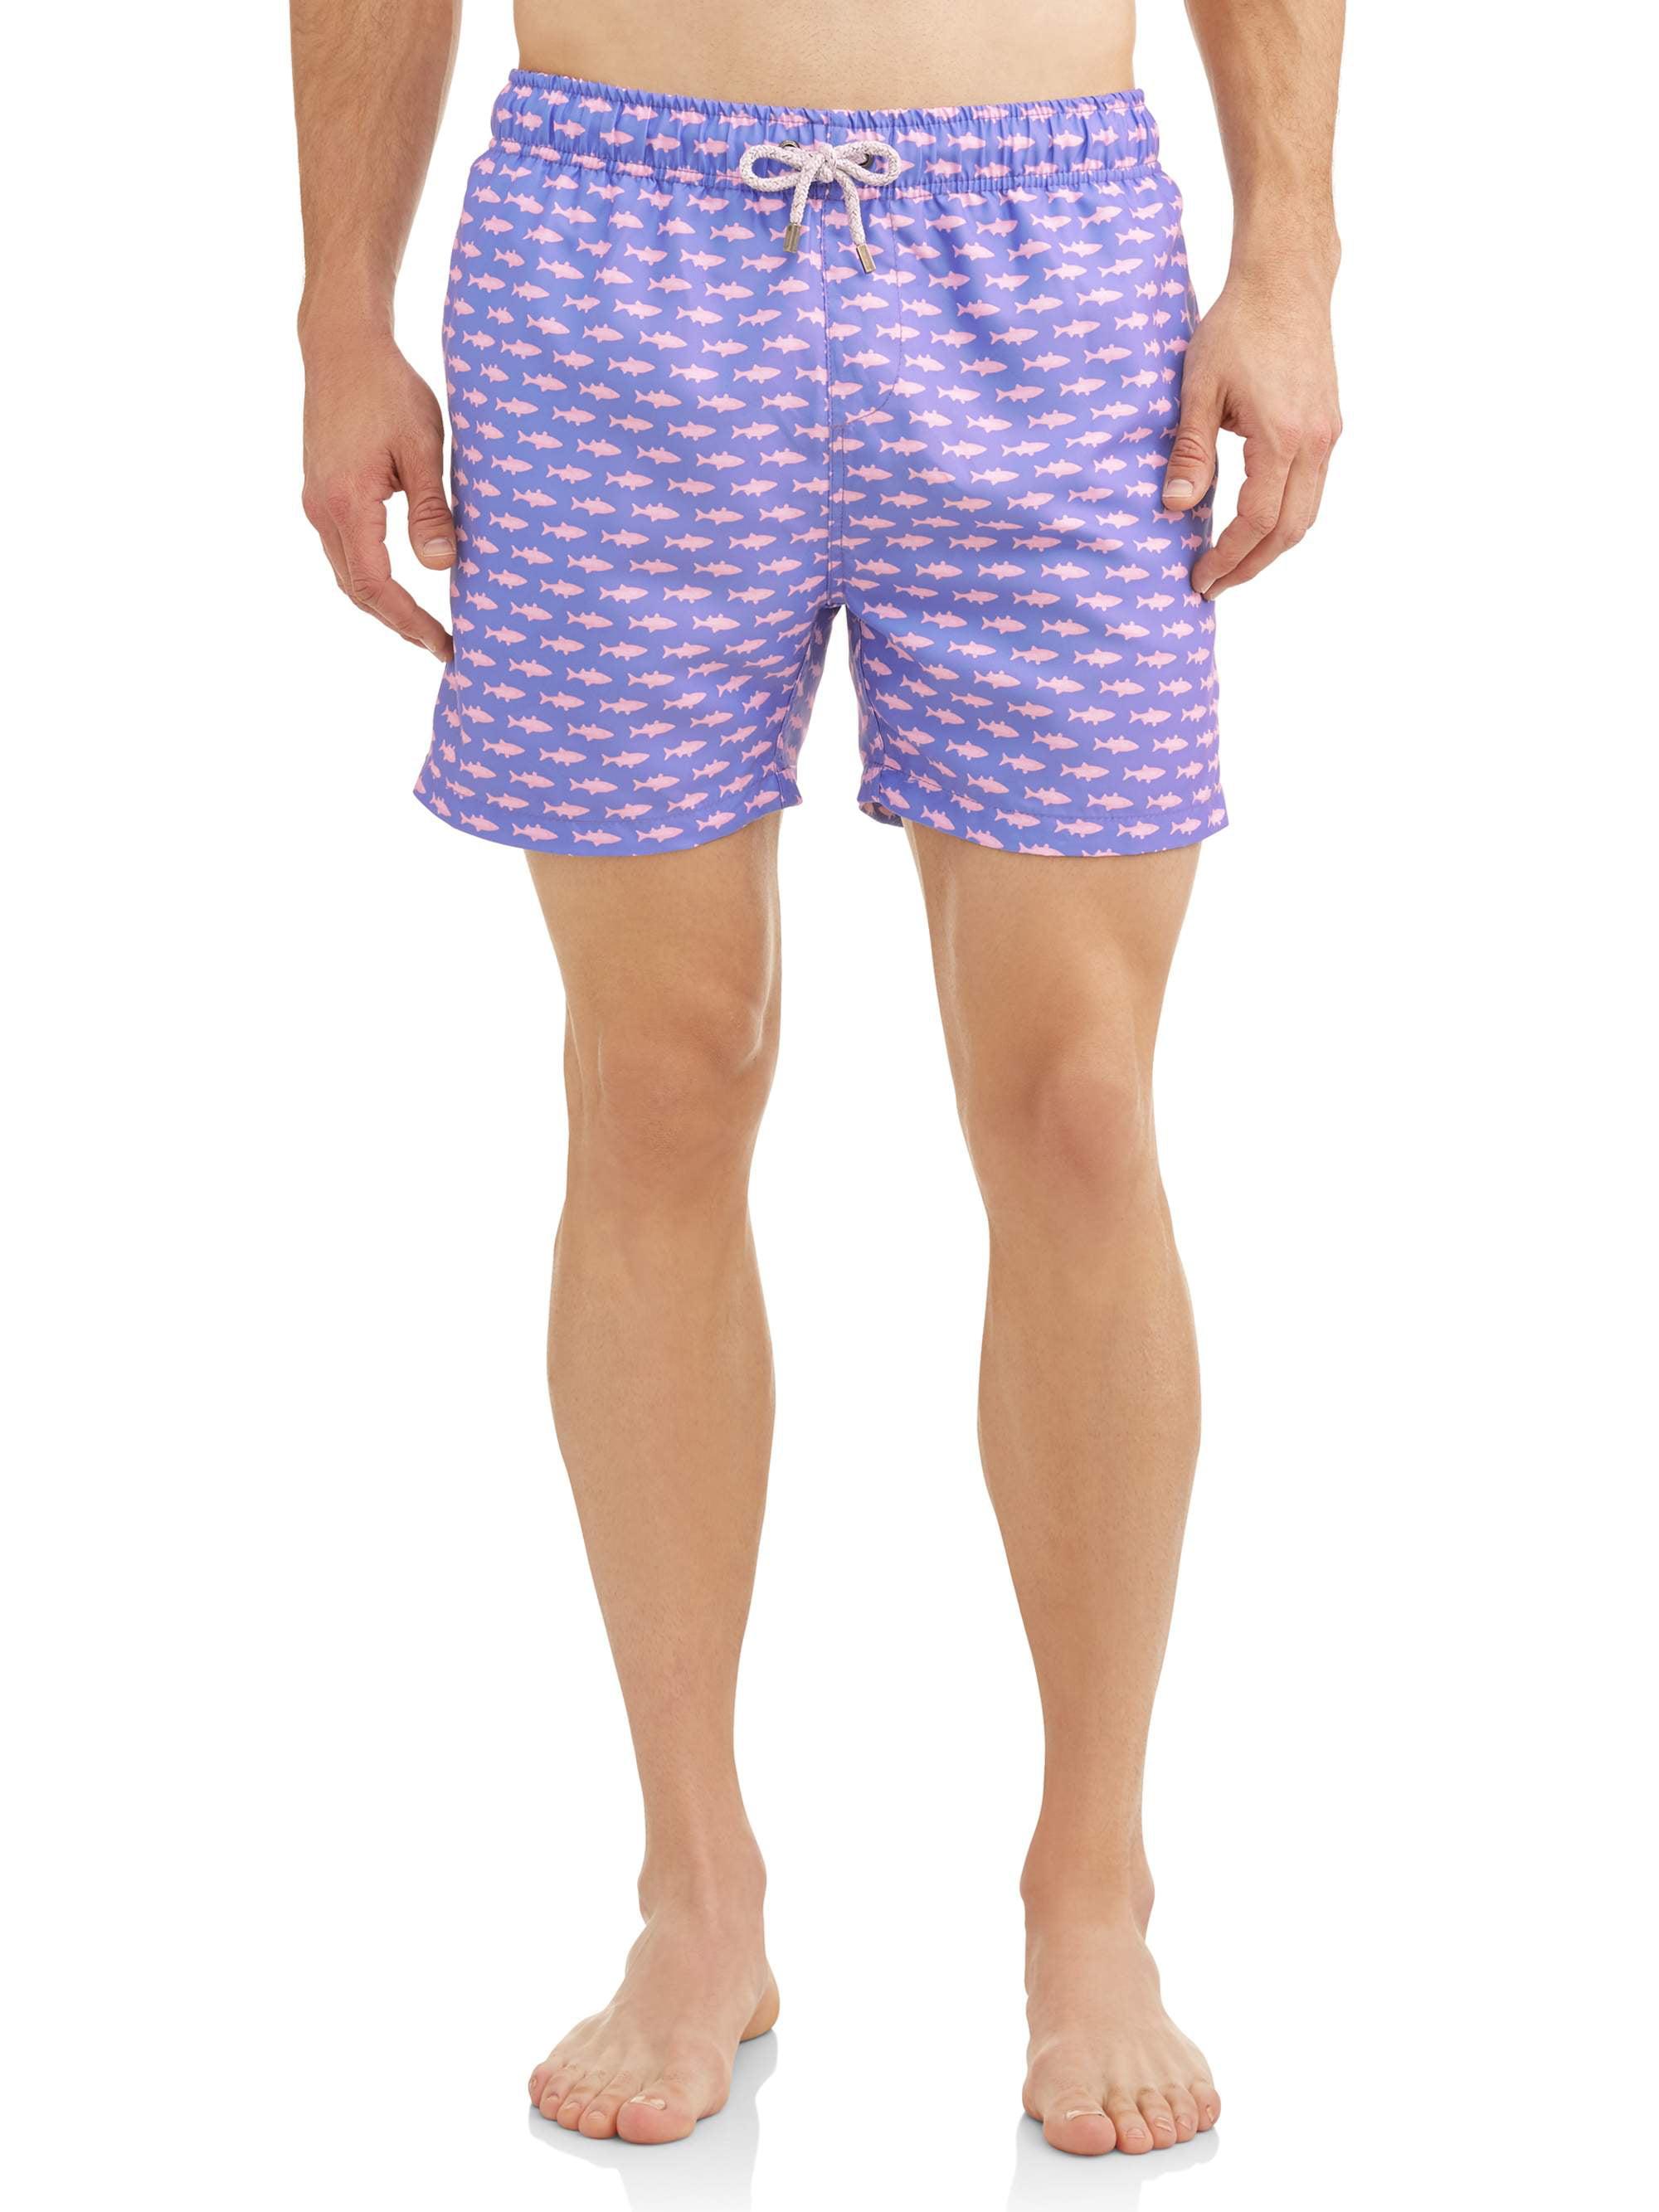 61b7b9d5b0 Endless Summer - Endless Summer Men's Printed Volley 5.5 Inch Swim Shorts.  Up to size 2XL - Walmart.com